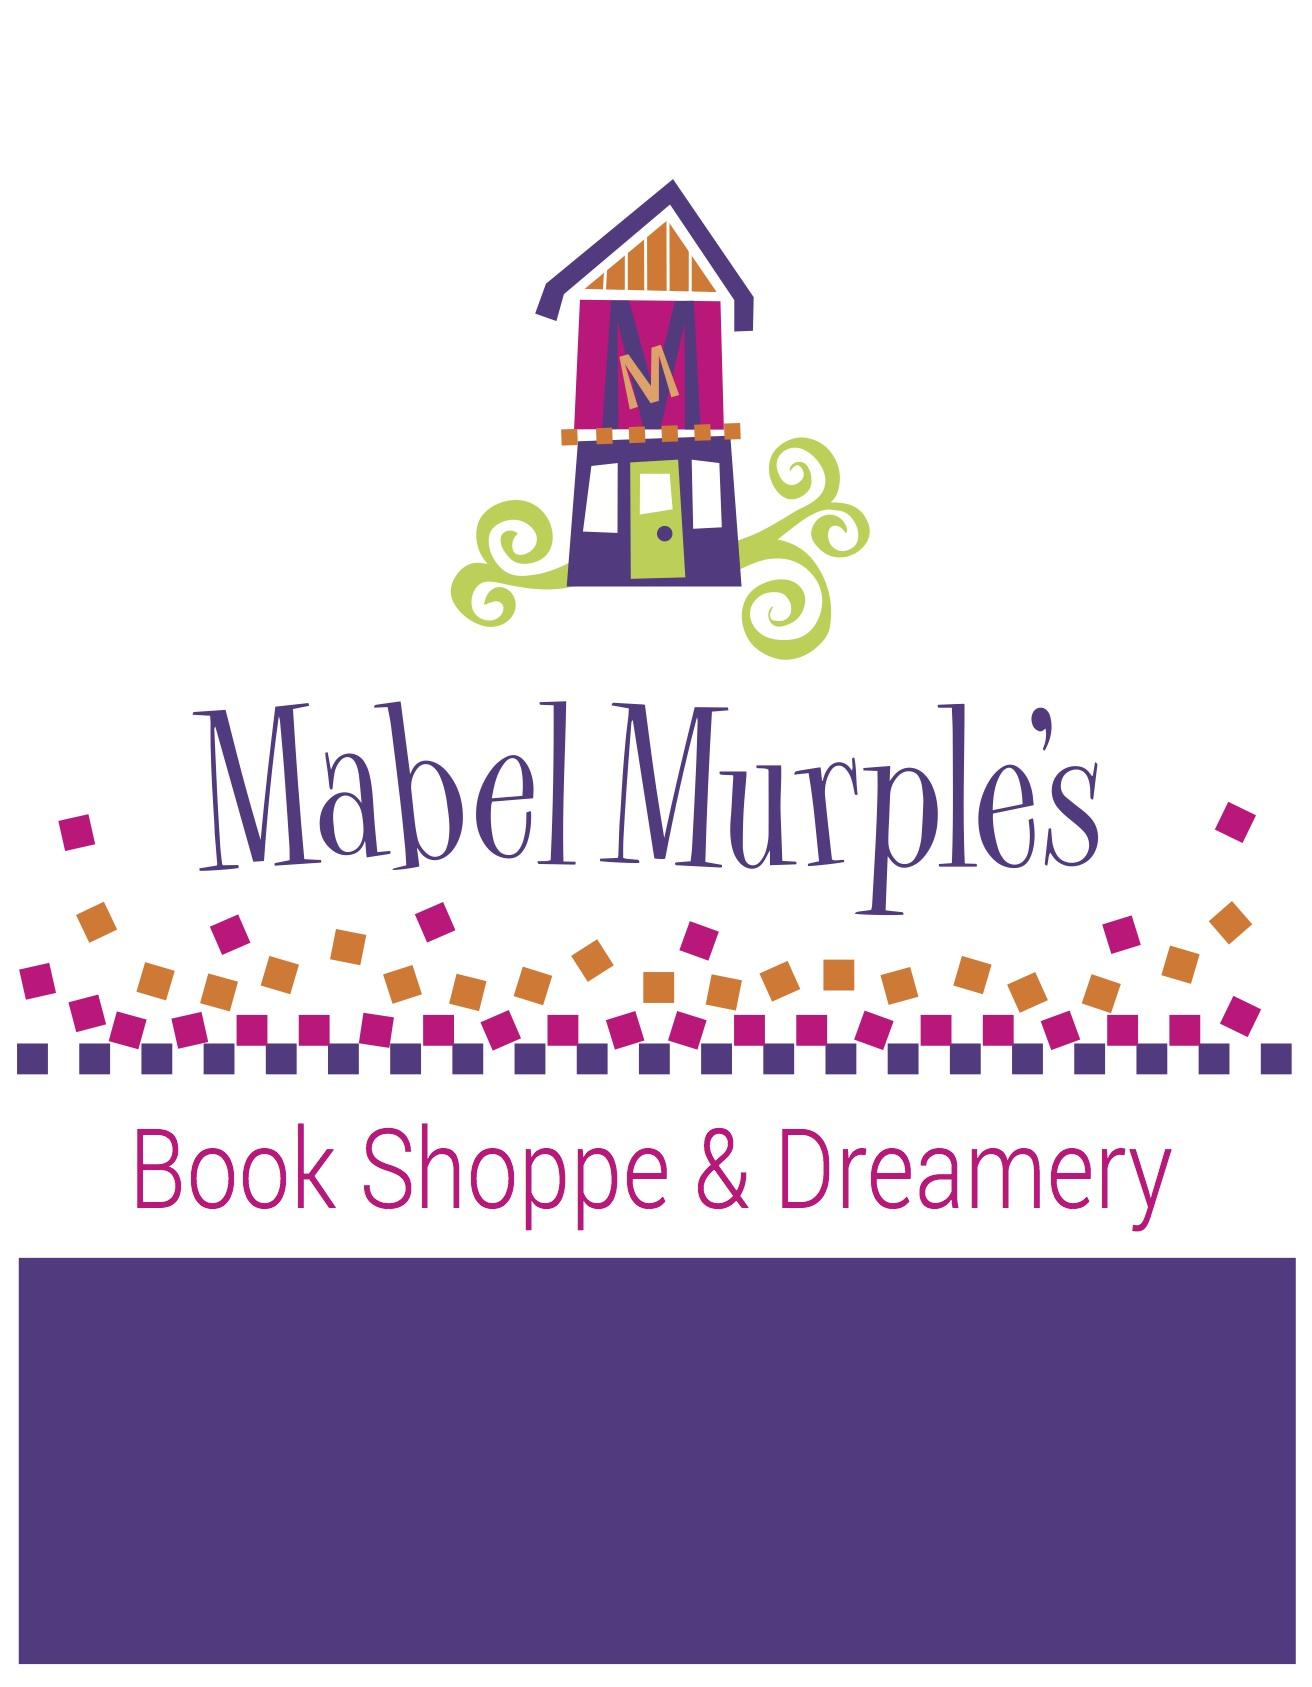 MM_Flying booksFeb13